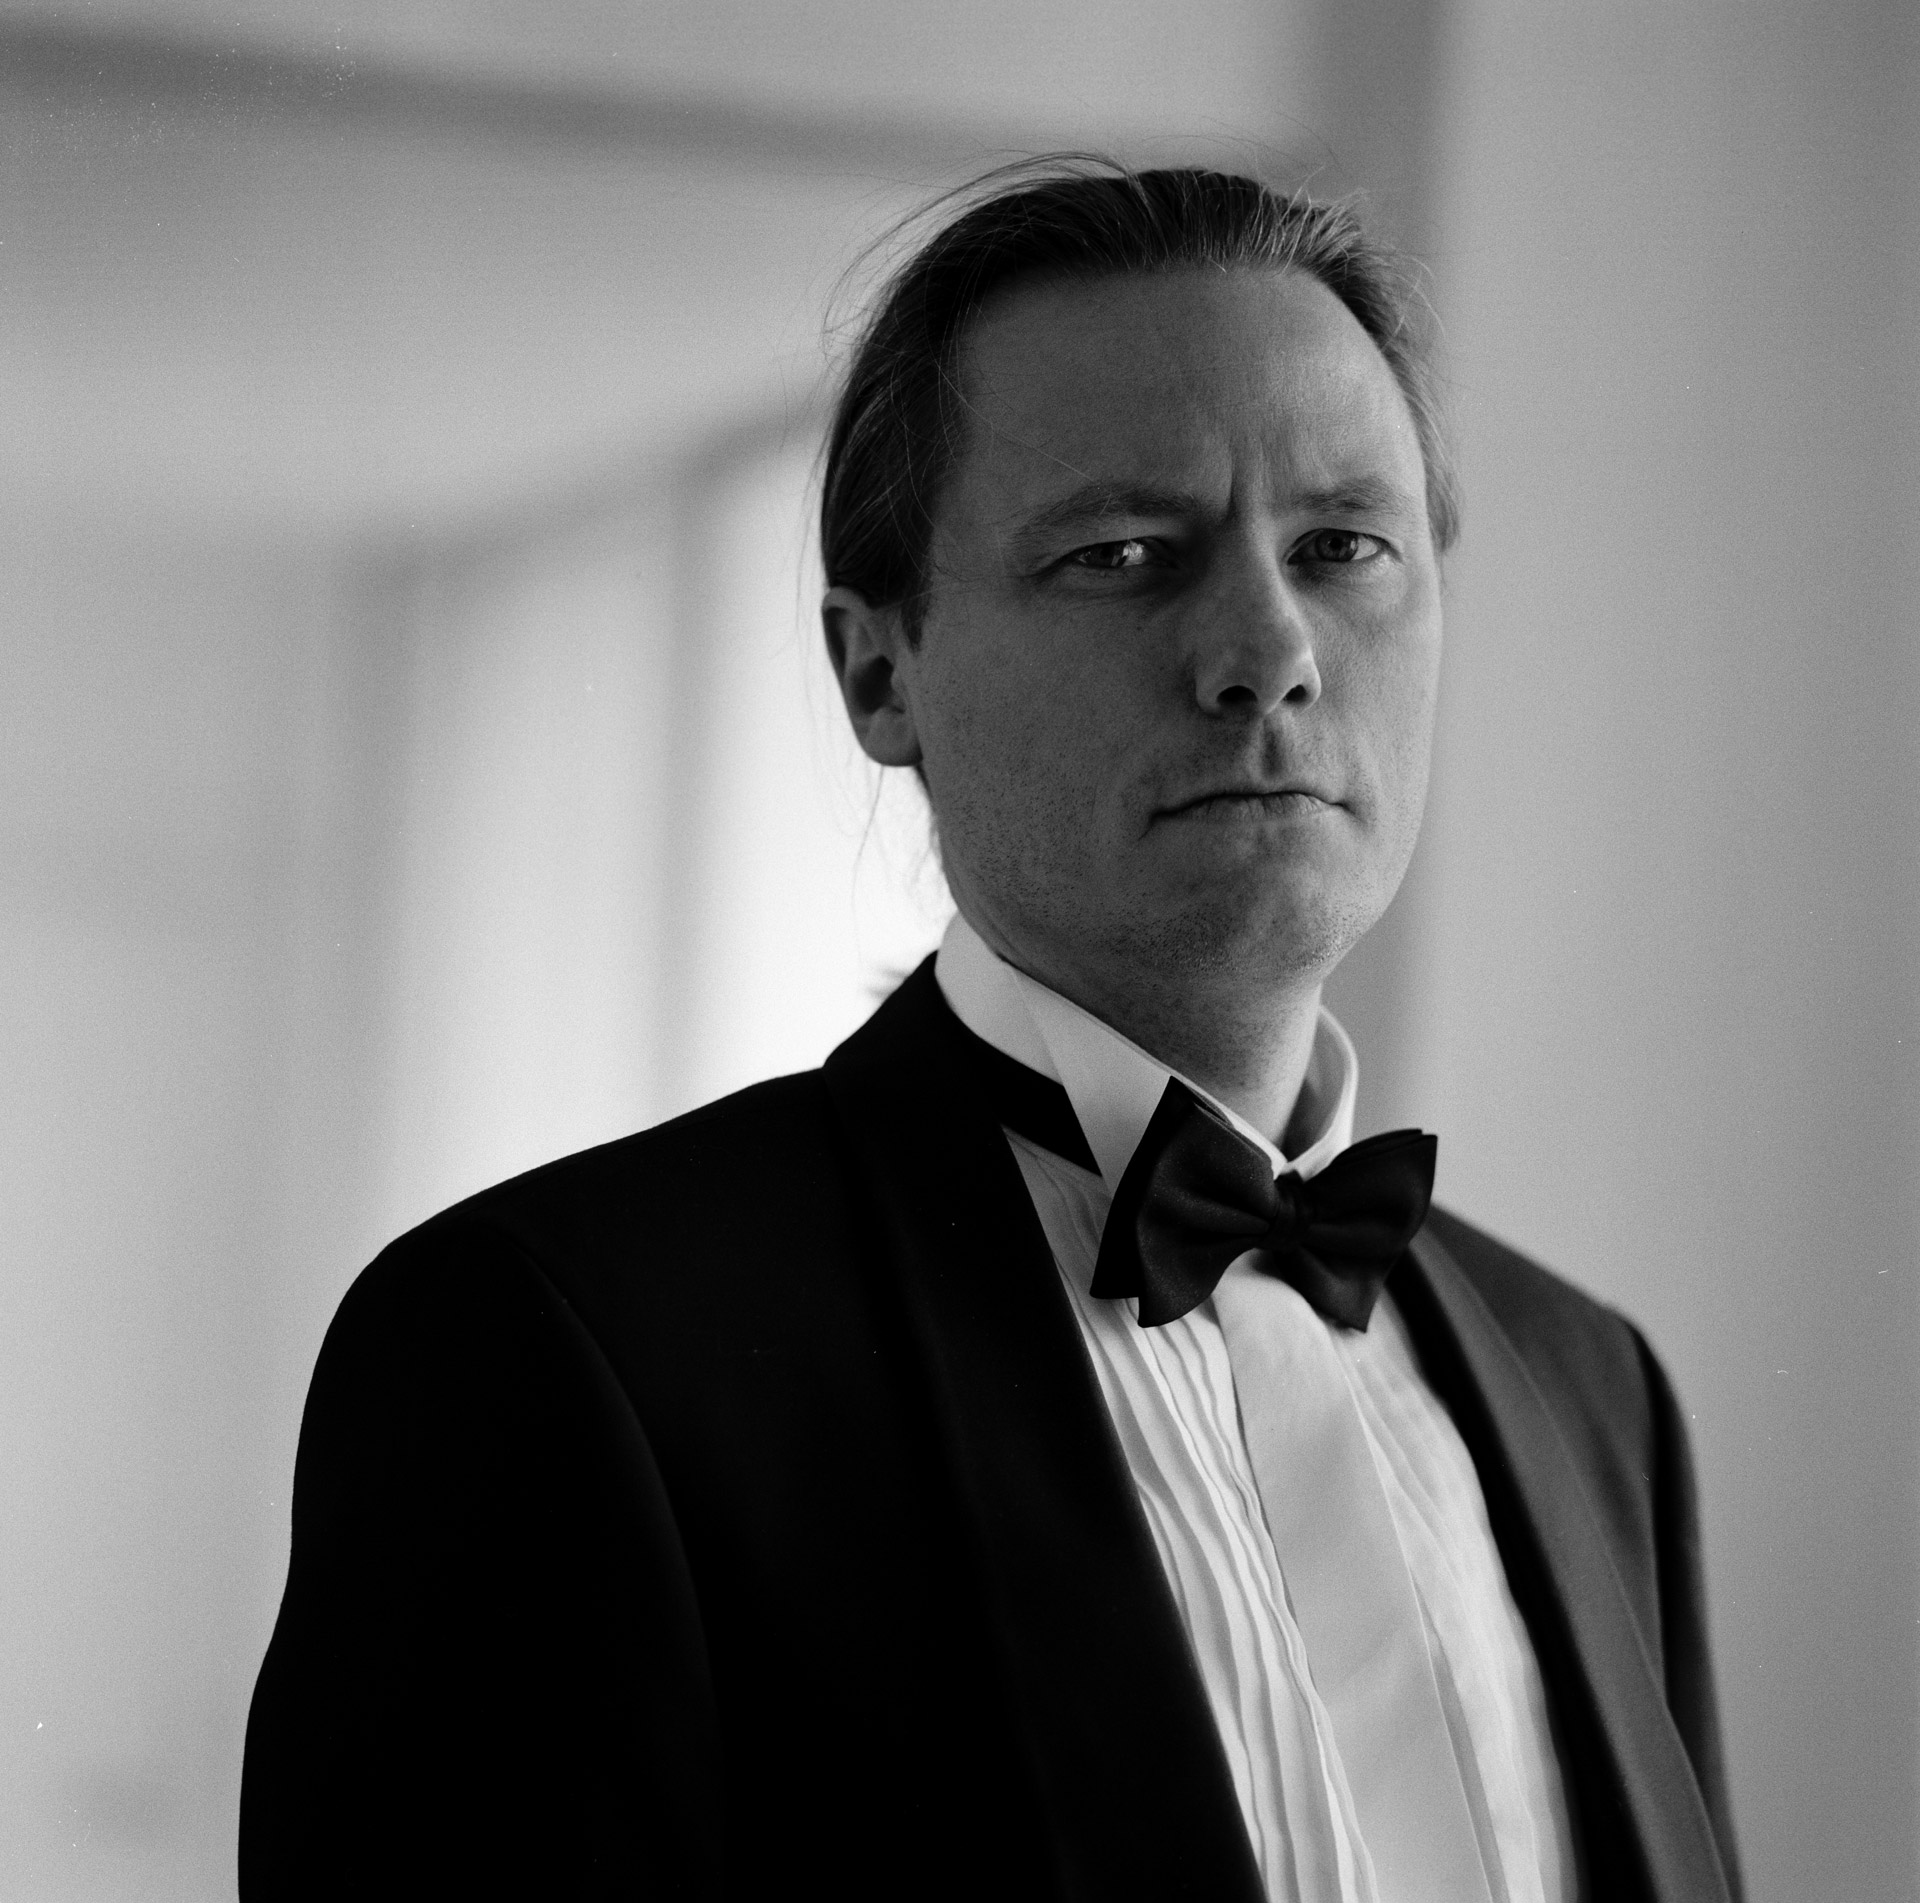 Danish classical guitarist Mikkel Andersen